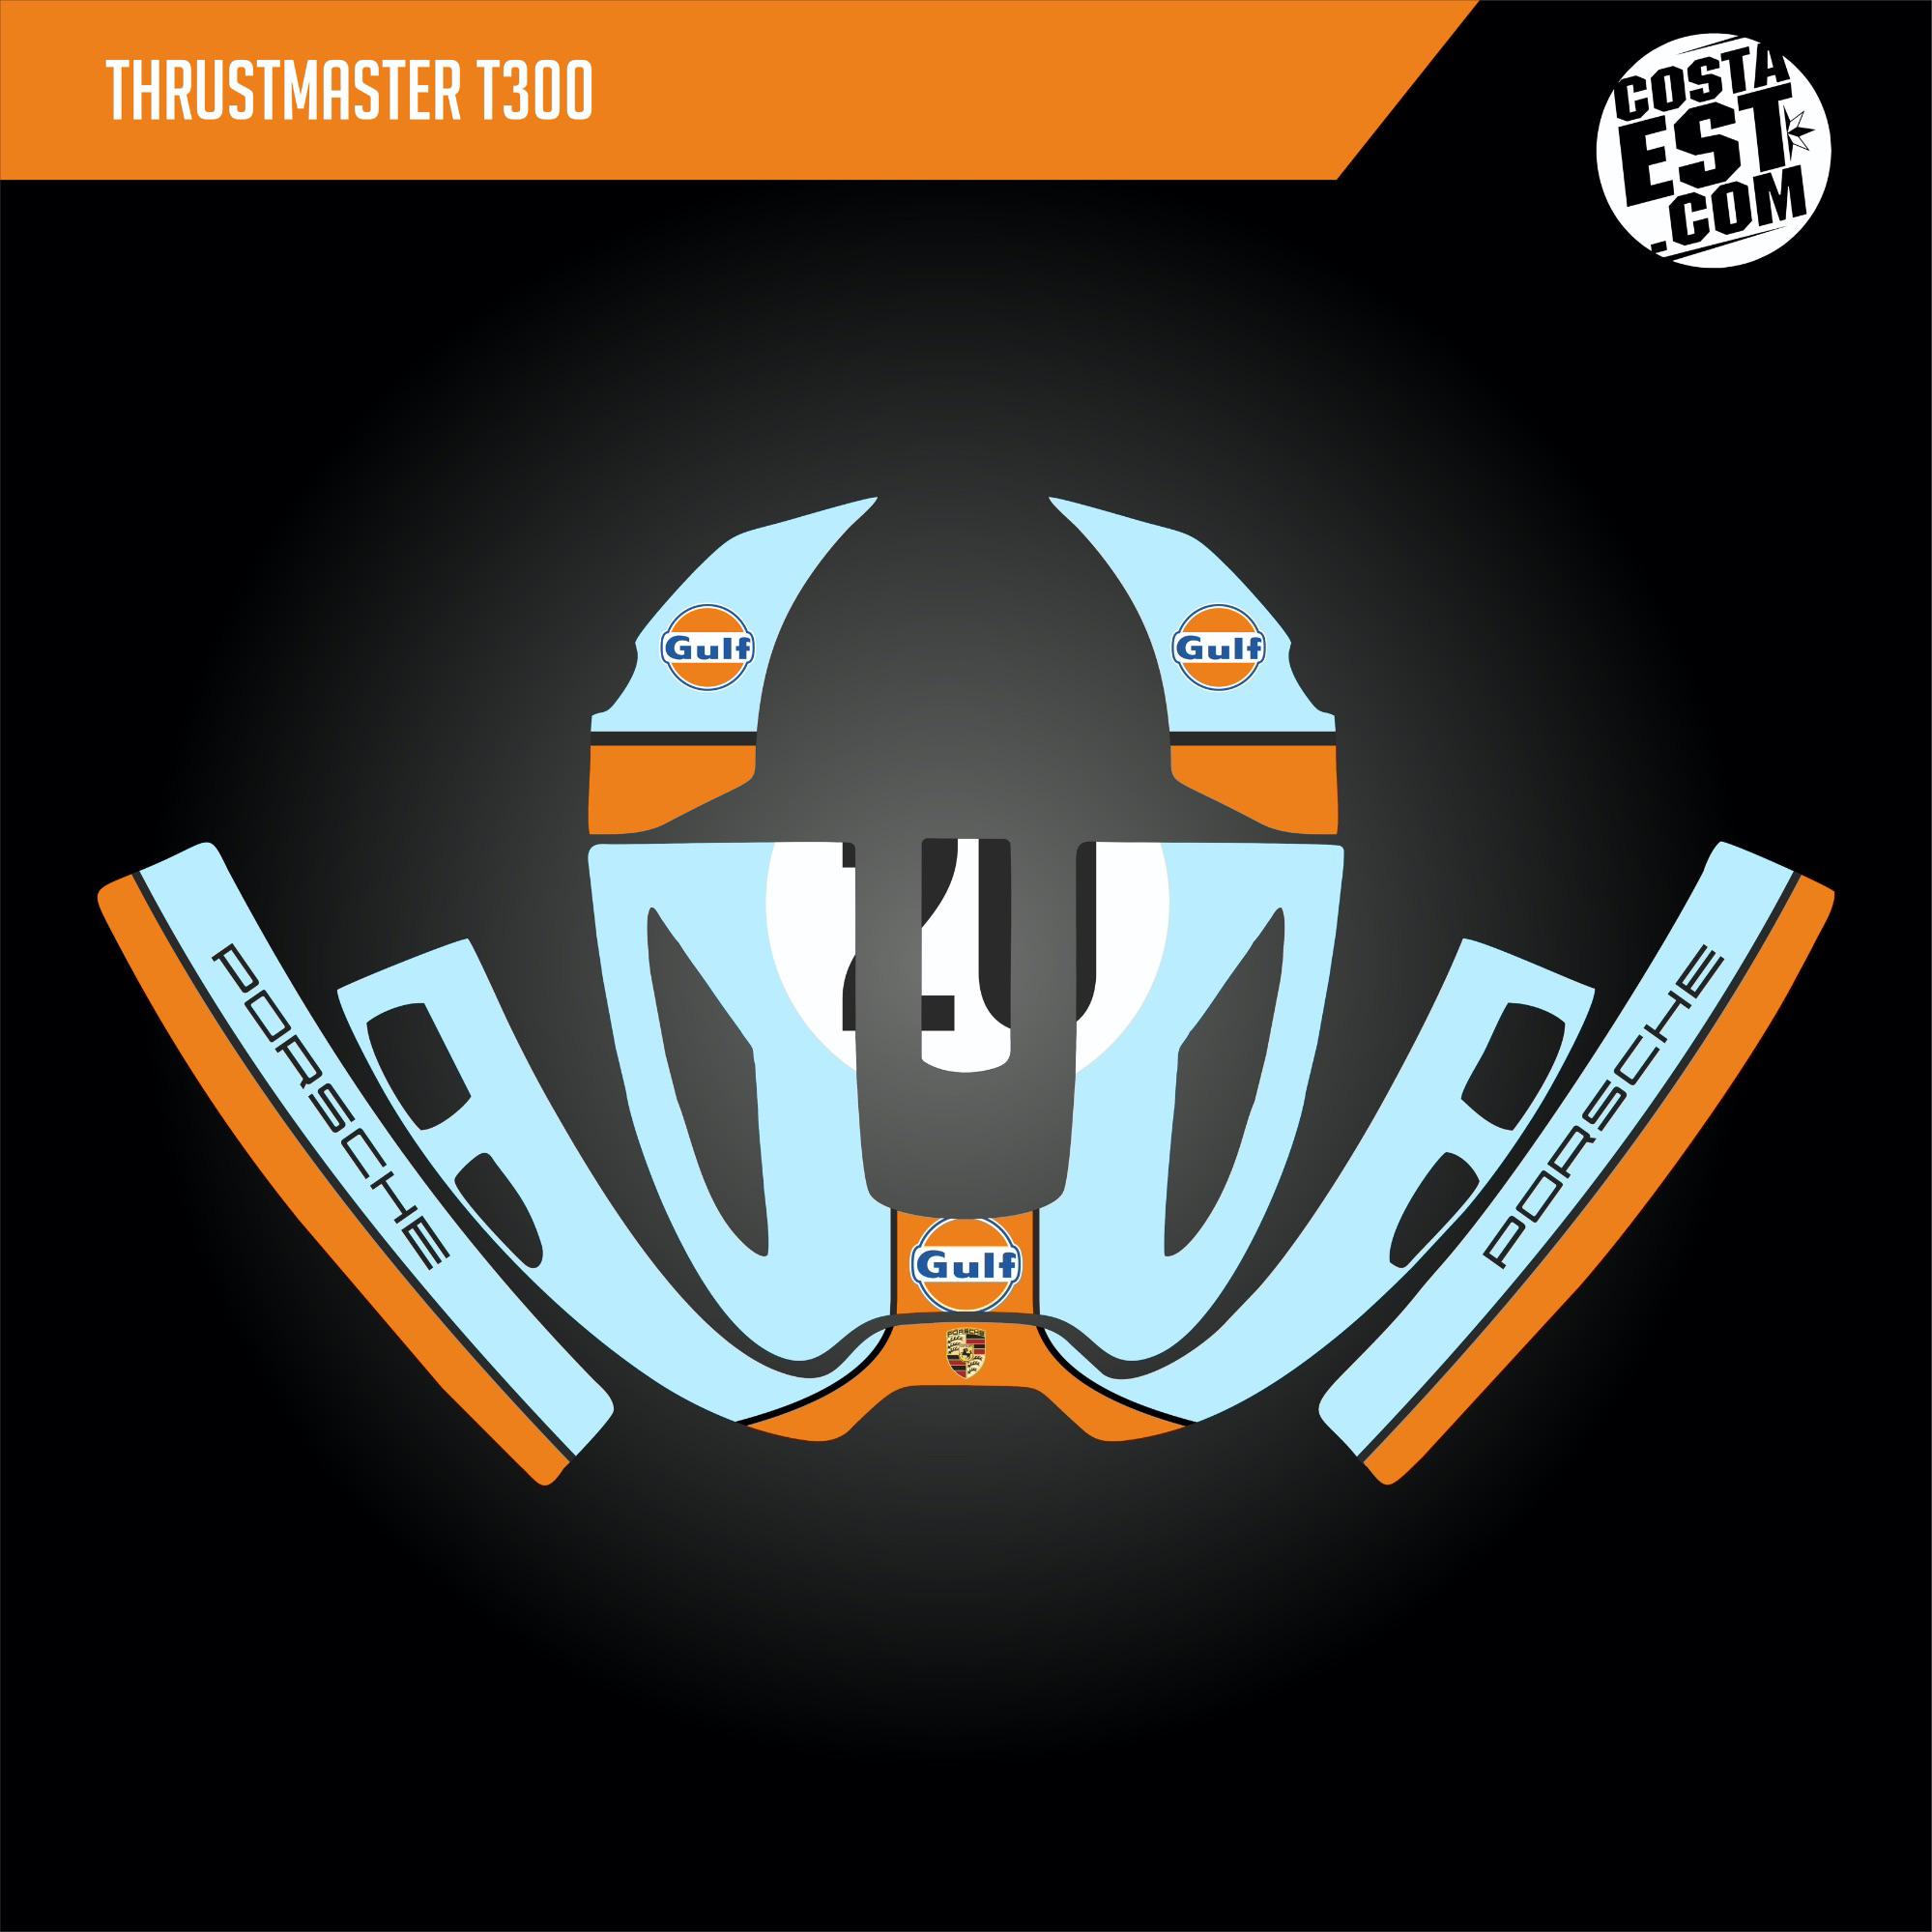 sticker-thrustmaster-t300-replica-gulf